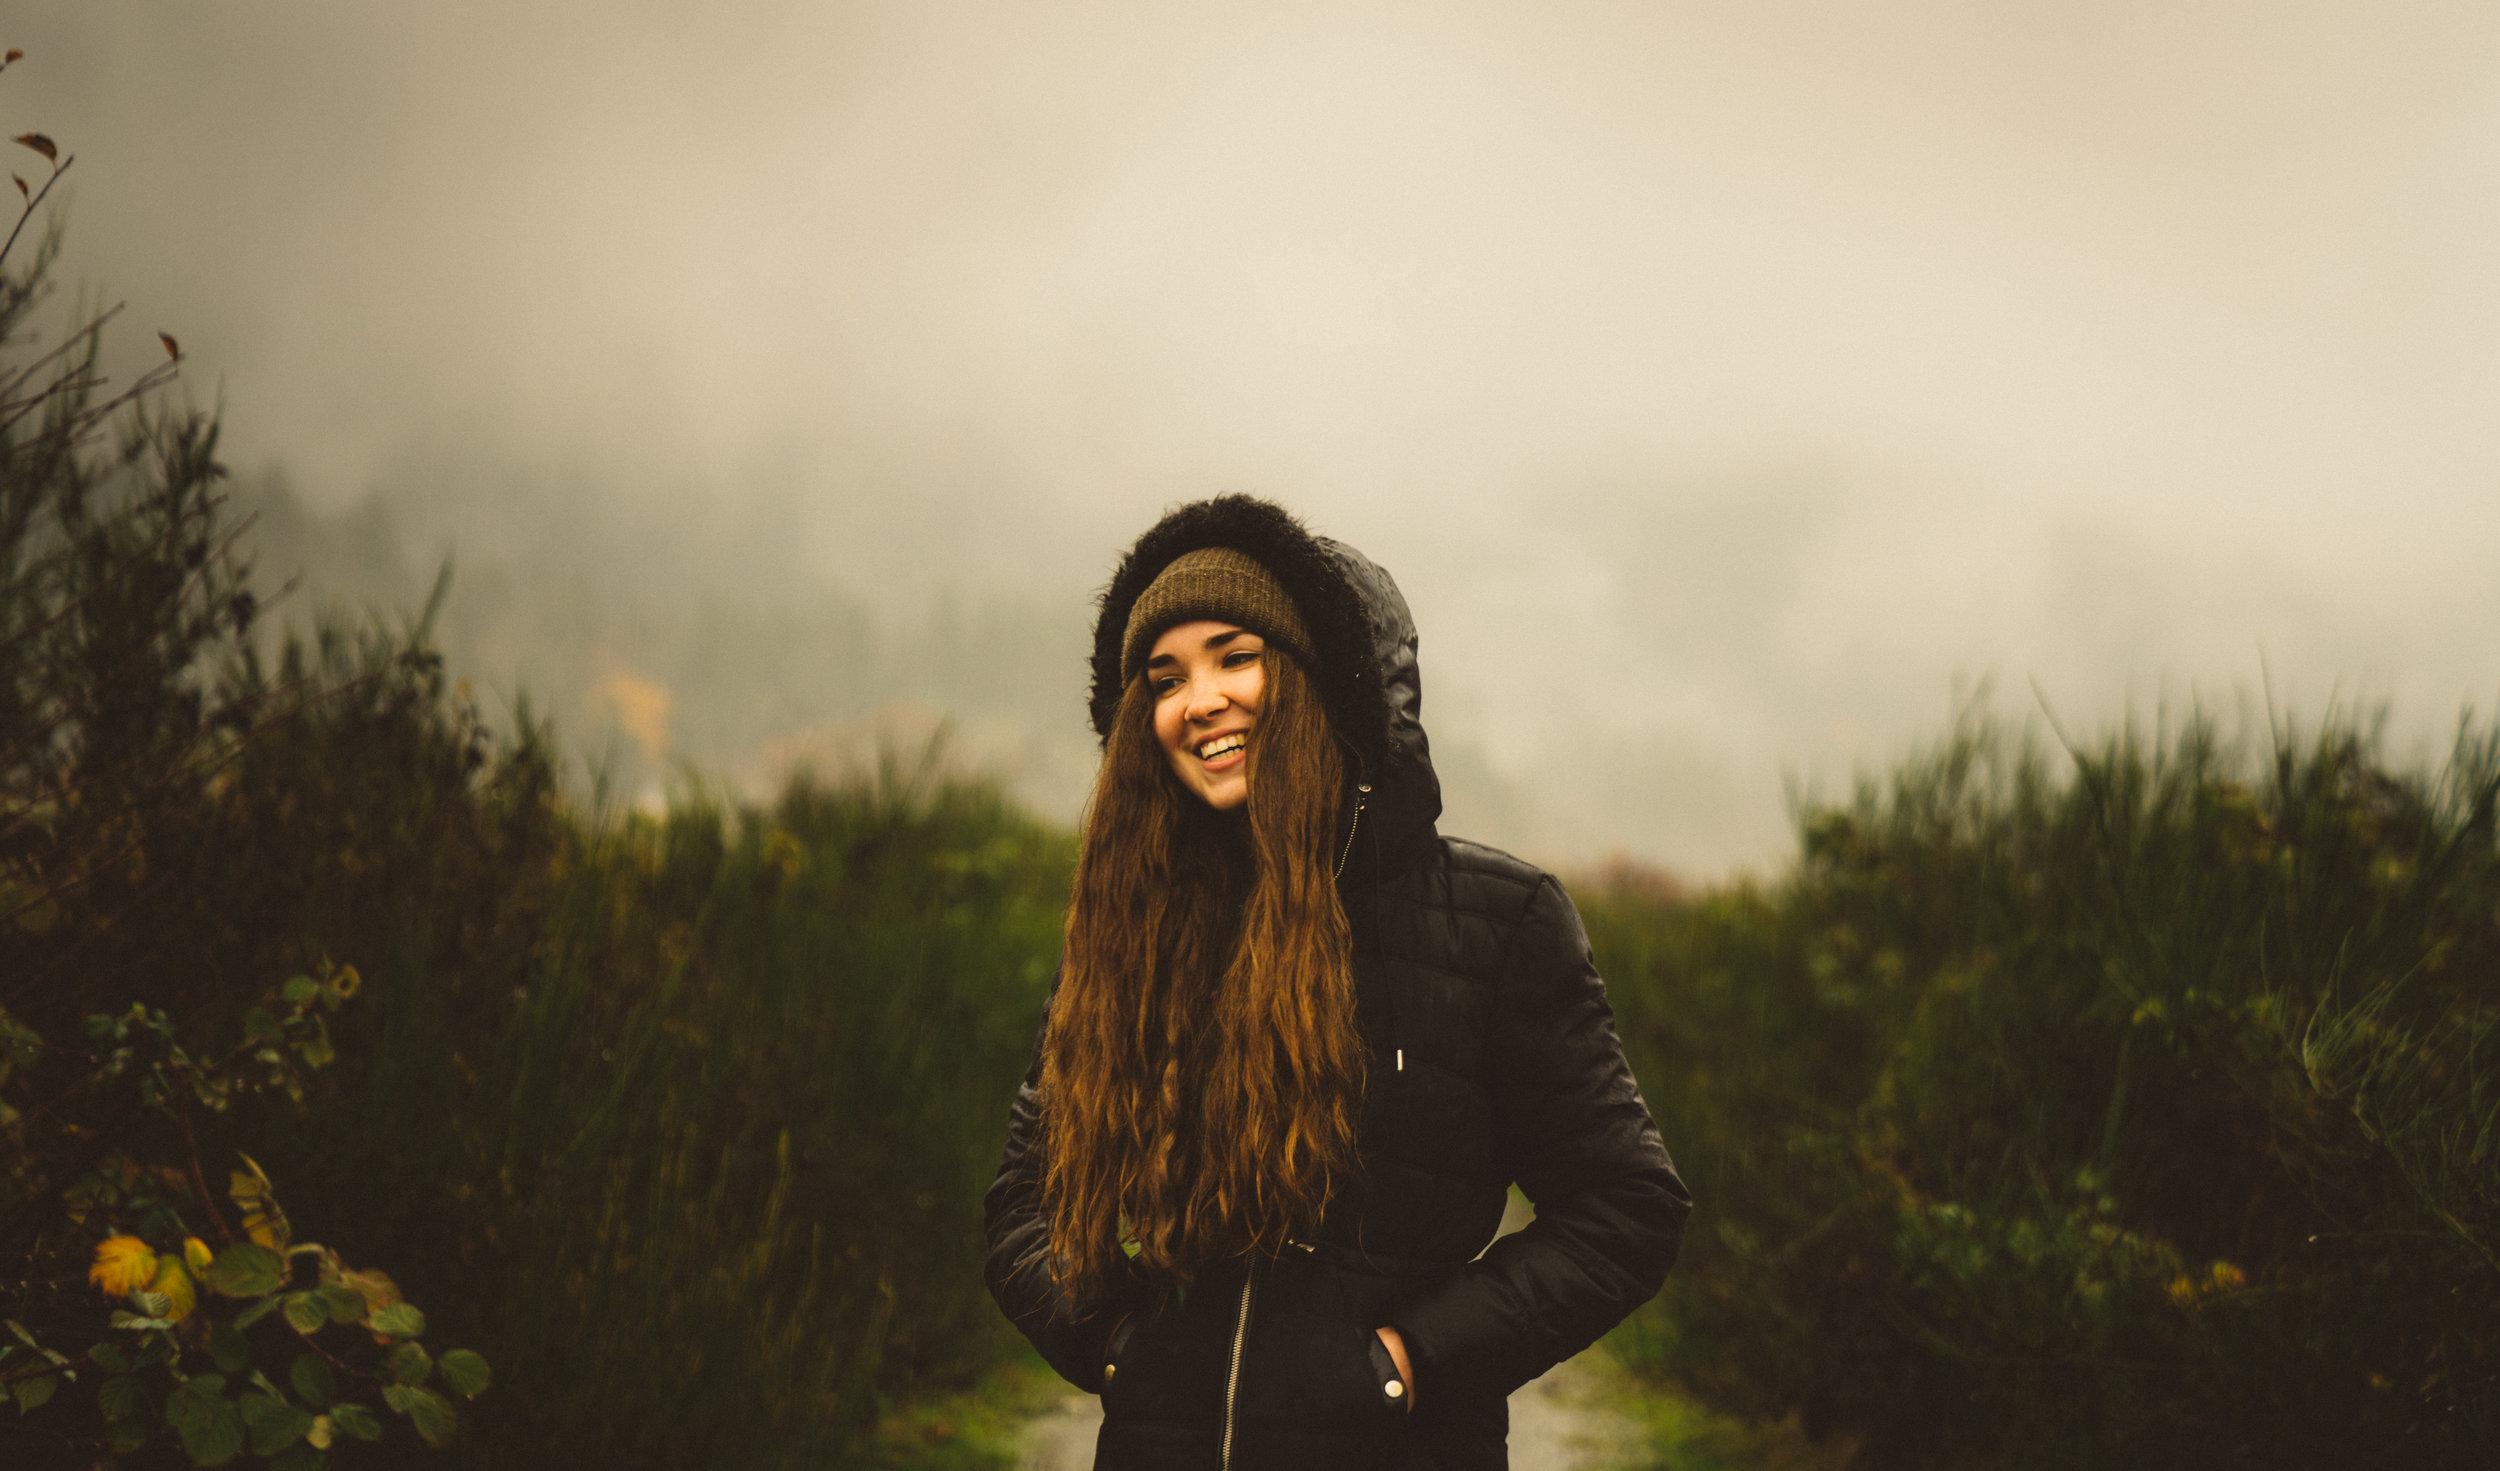 Nov. 21, 2017: Marijke in Cowichan Bay.